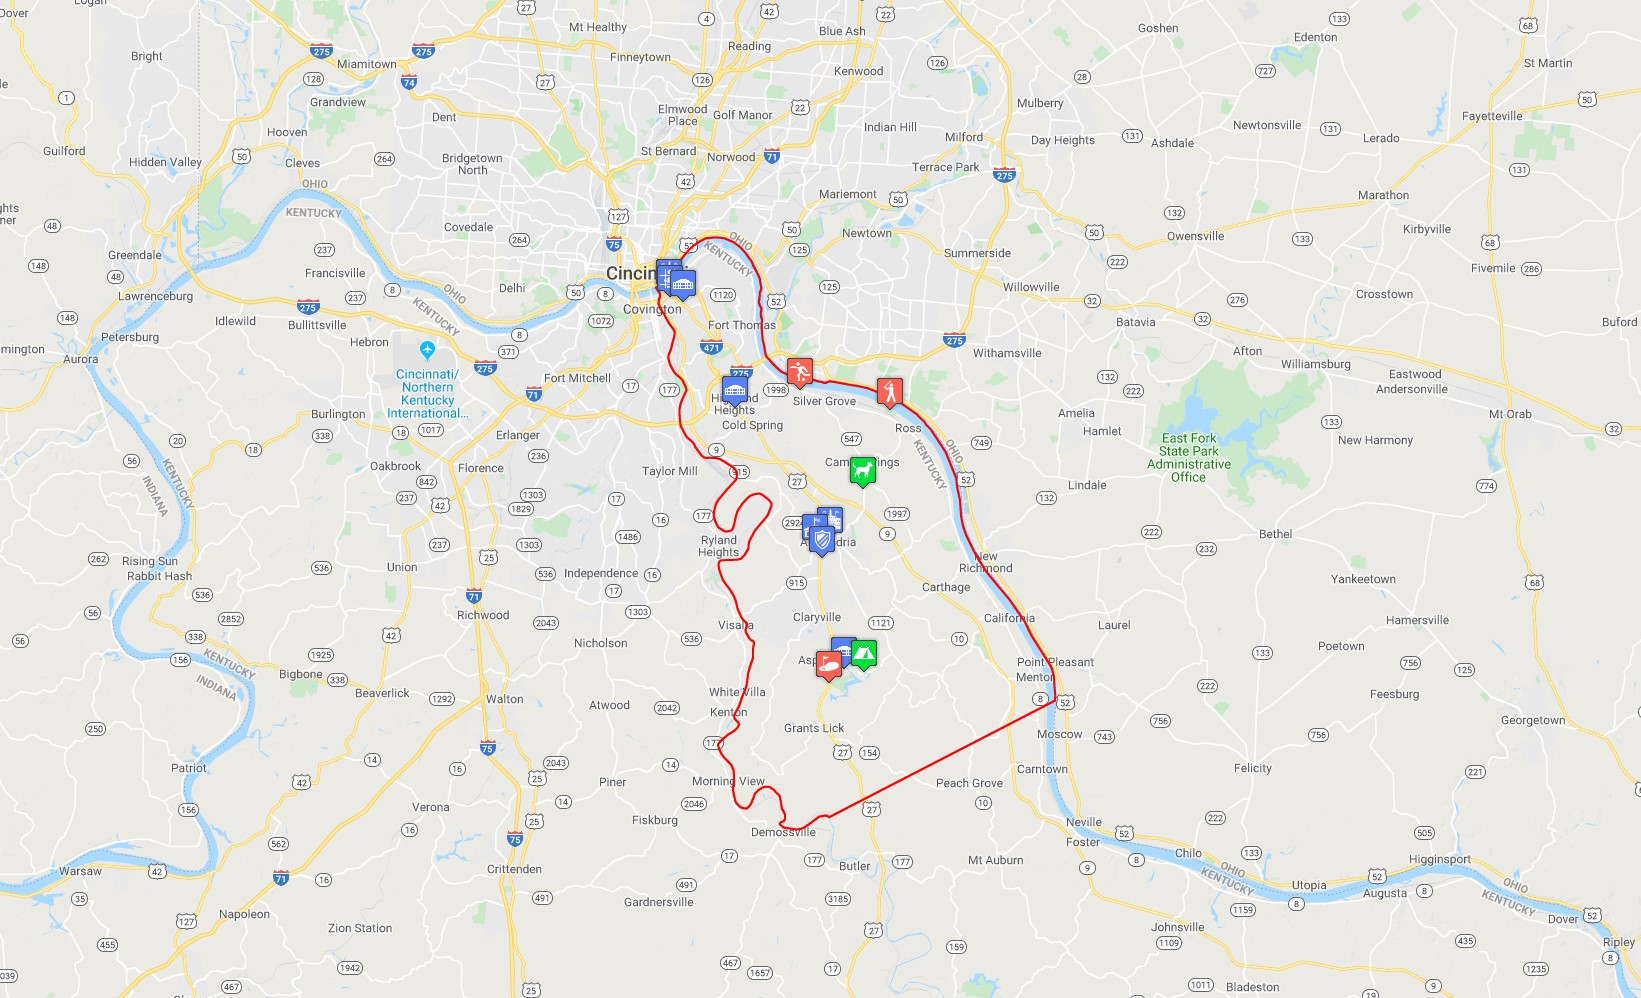 County Maps